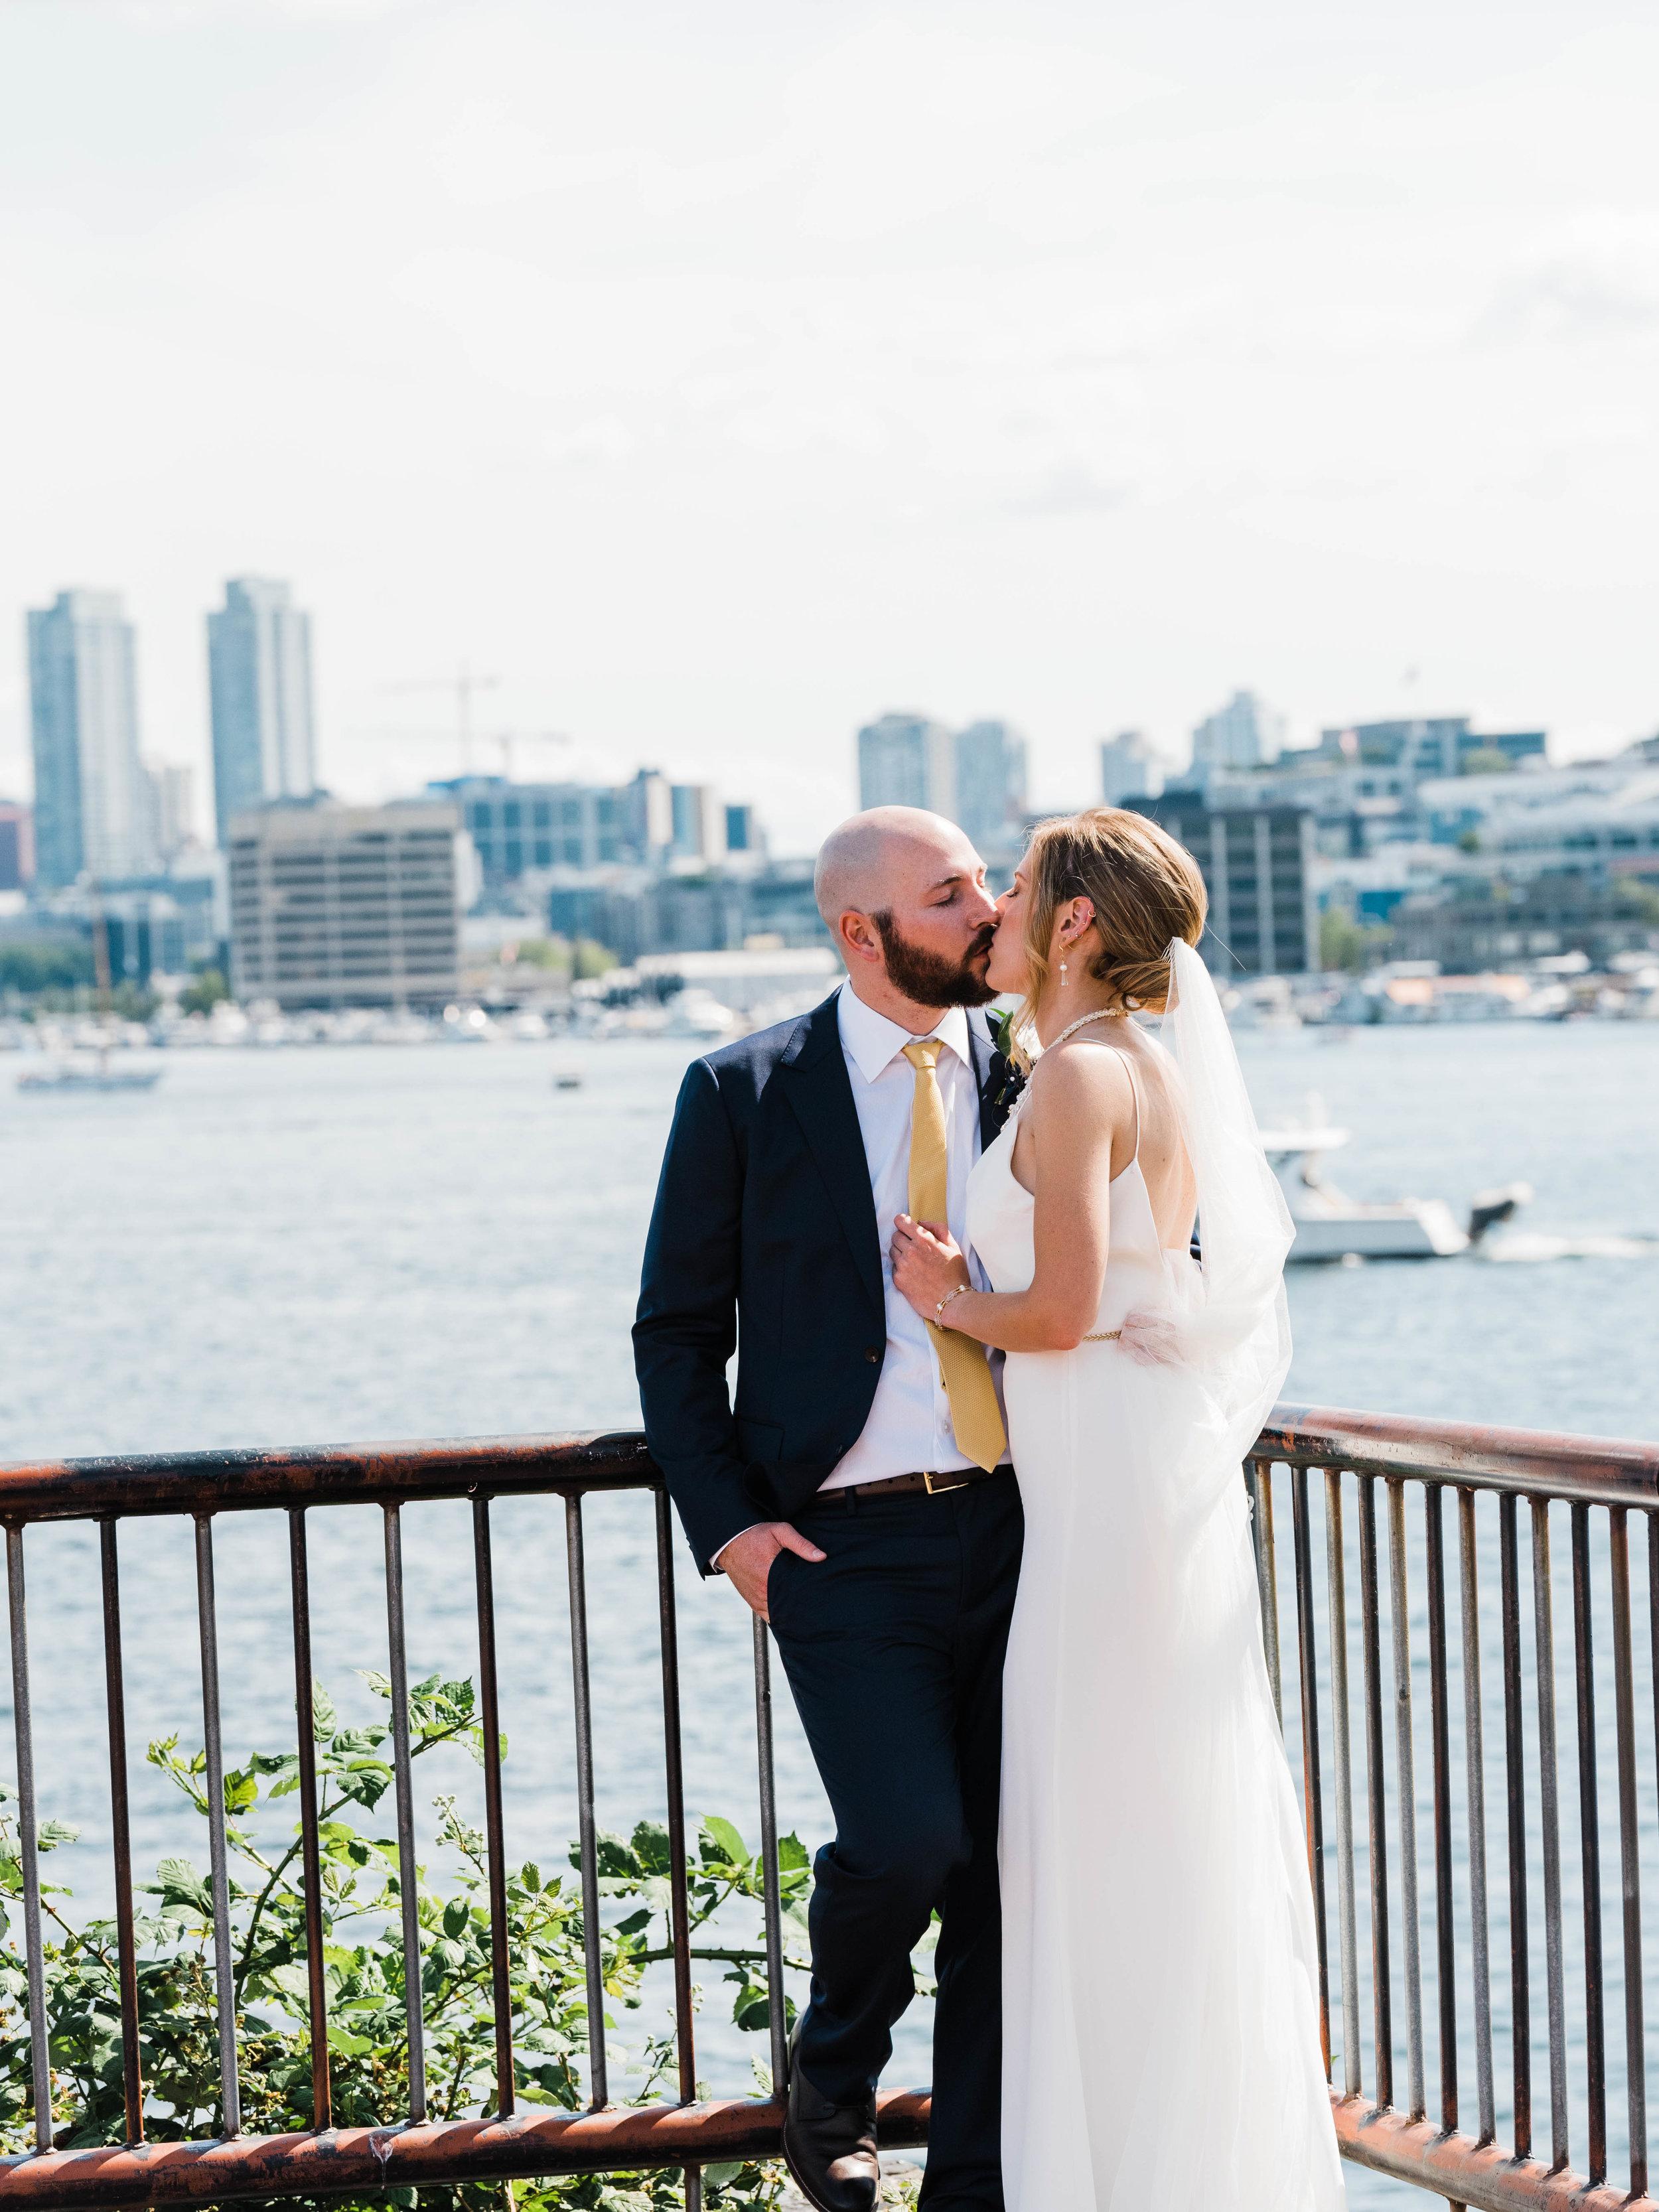 Seattle Wedding- MV Skansonia - Anna + Josh -  (919) - Copy.jpg